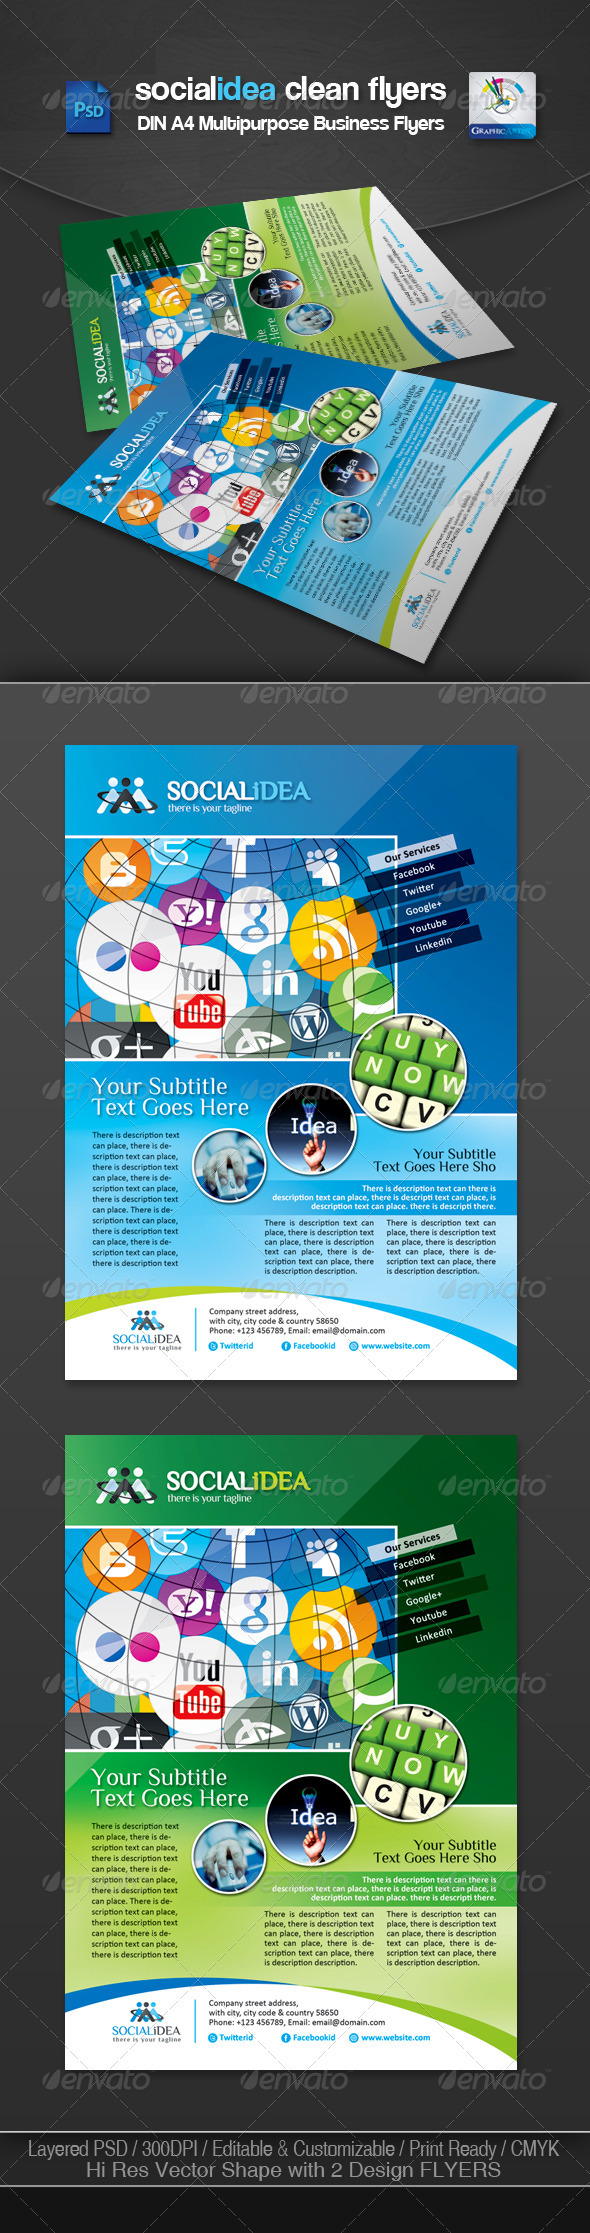 GraphicRiver Socialidea Corporate Social Media Flyer Ads 3551805